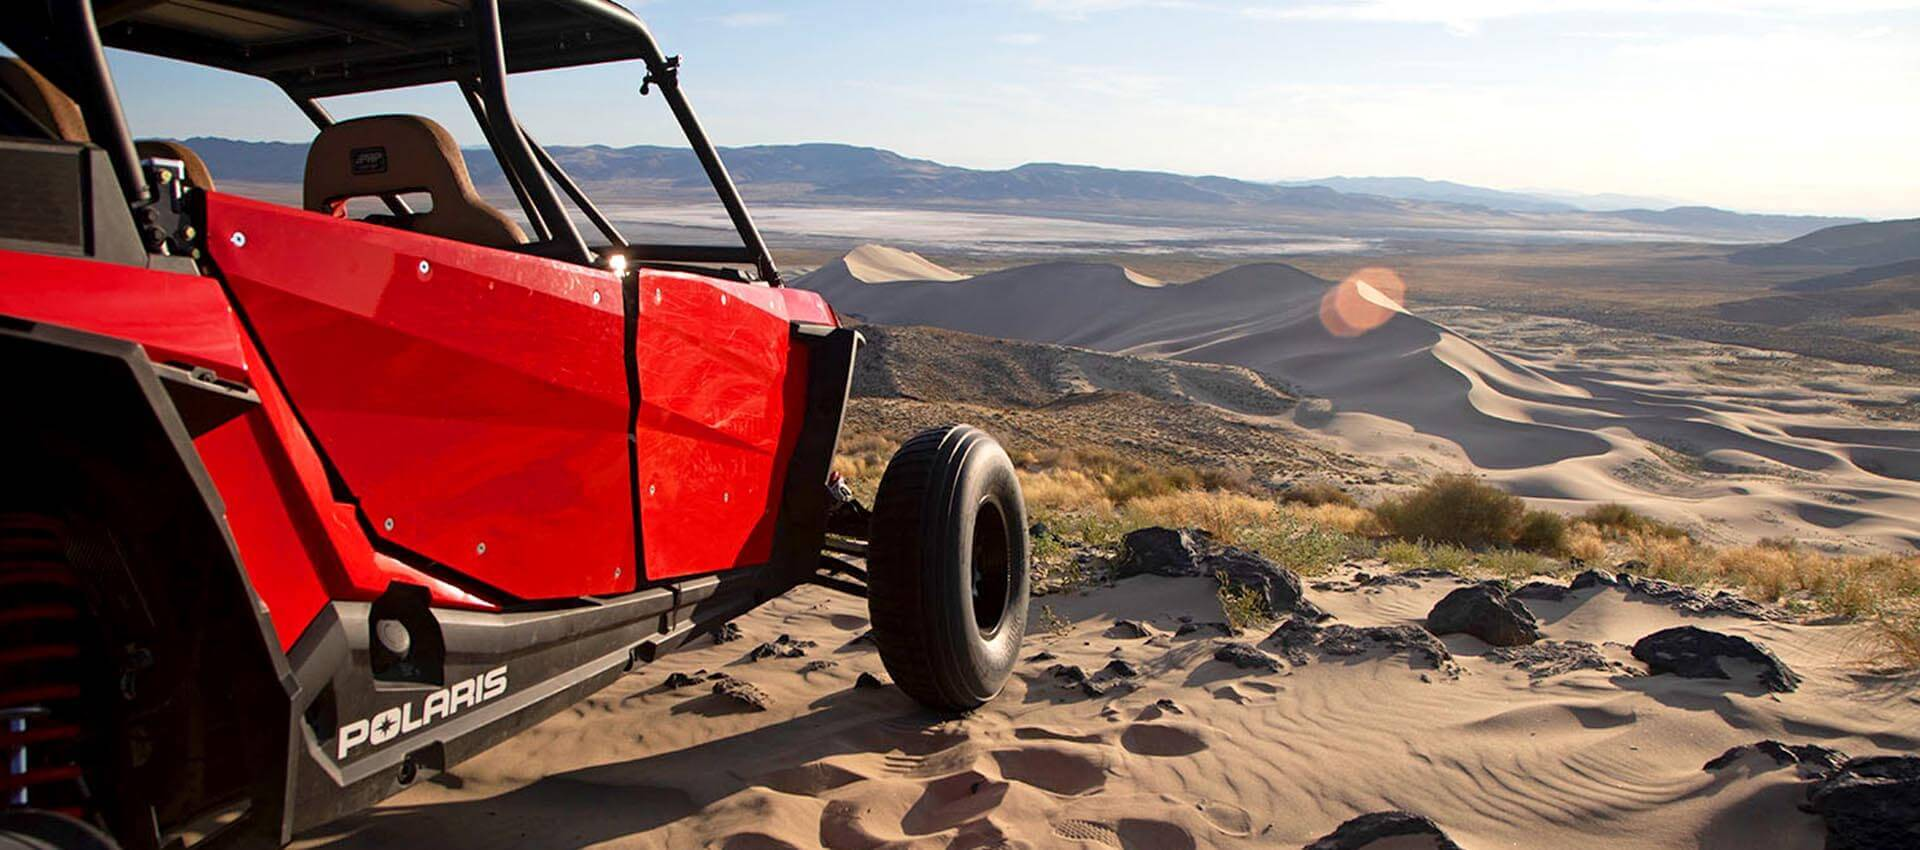 Nevada Recreation, Nevada Outdoor Recreation, Outdoor Recreation in Nevada